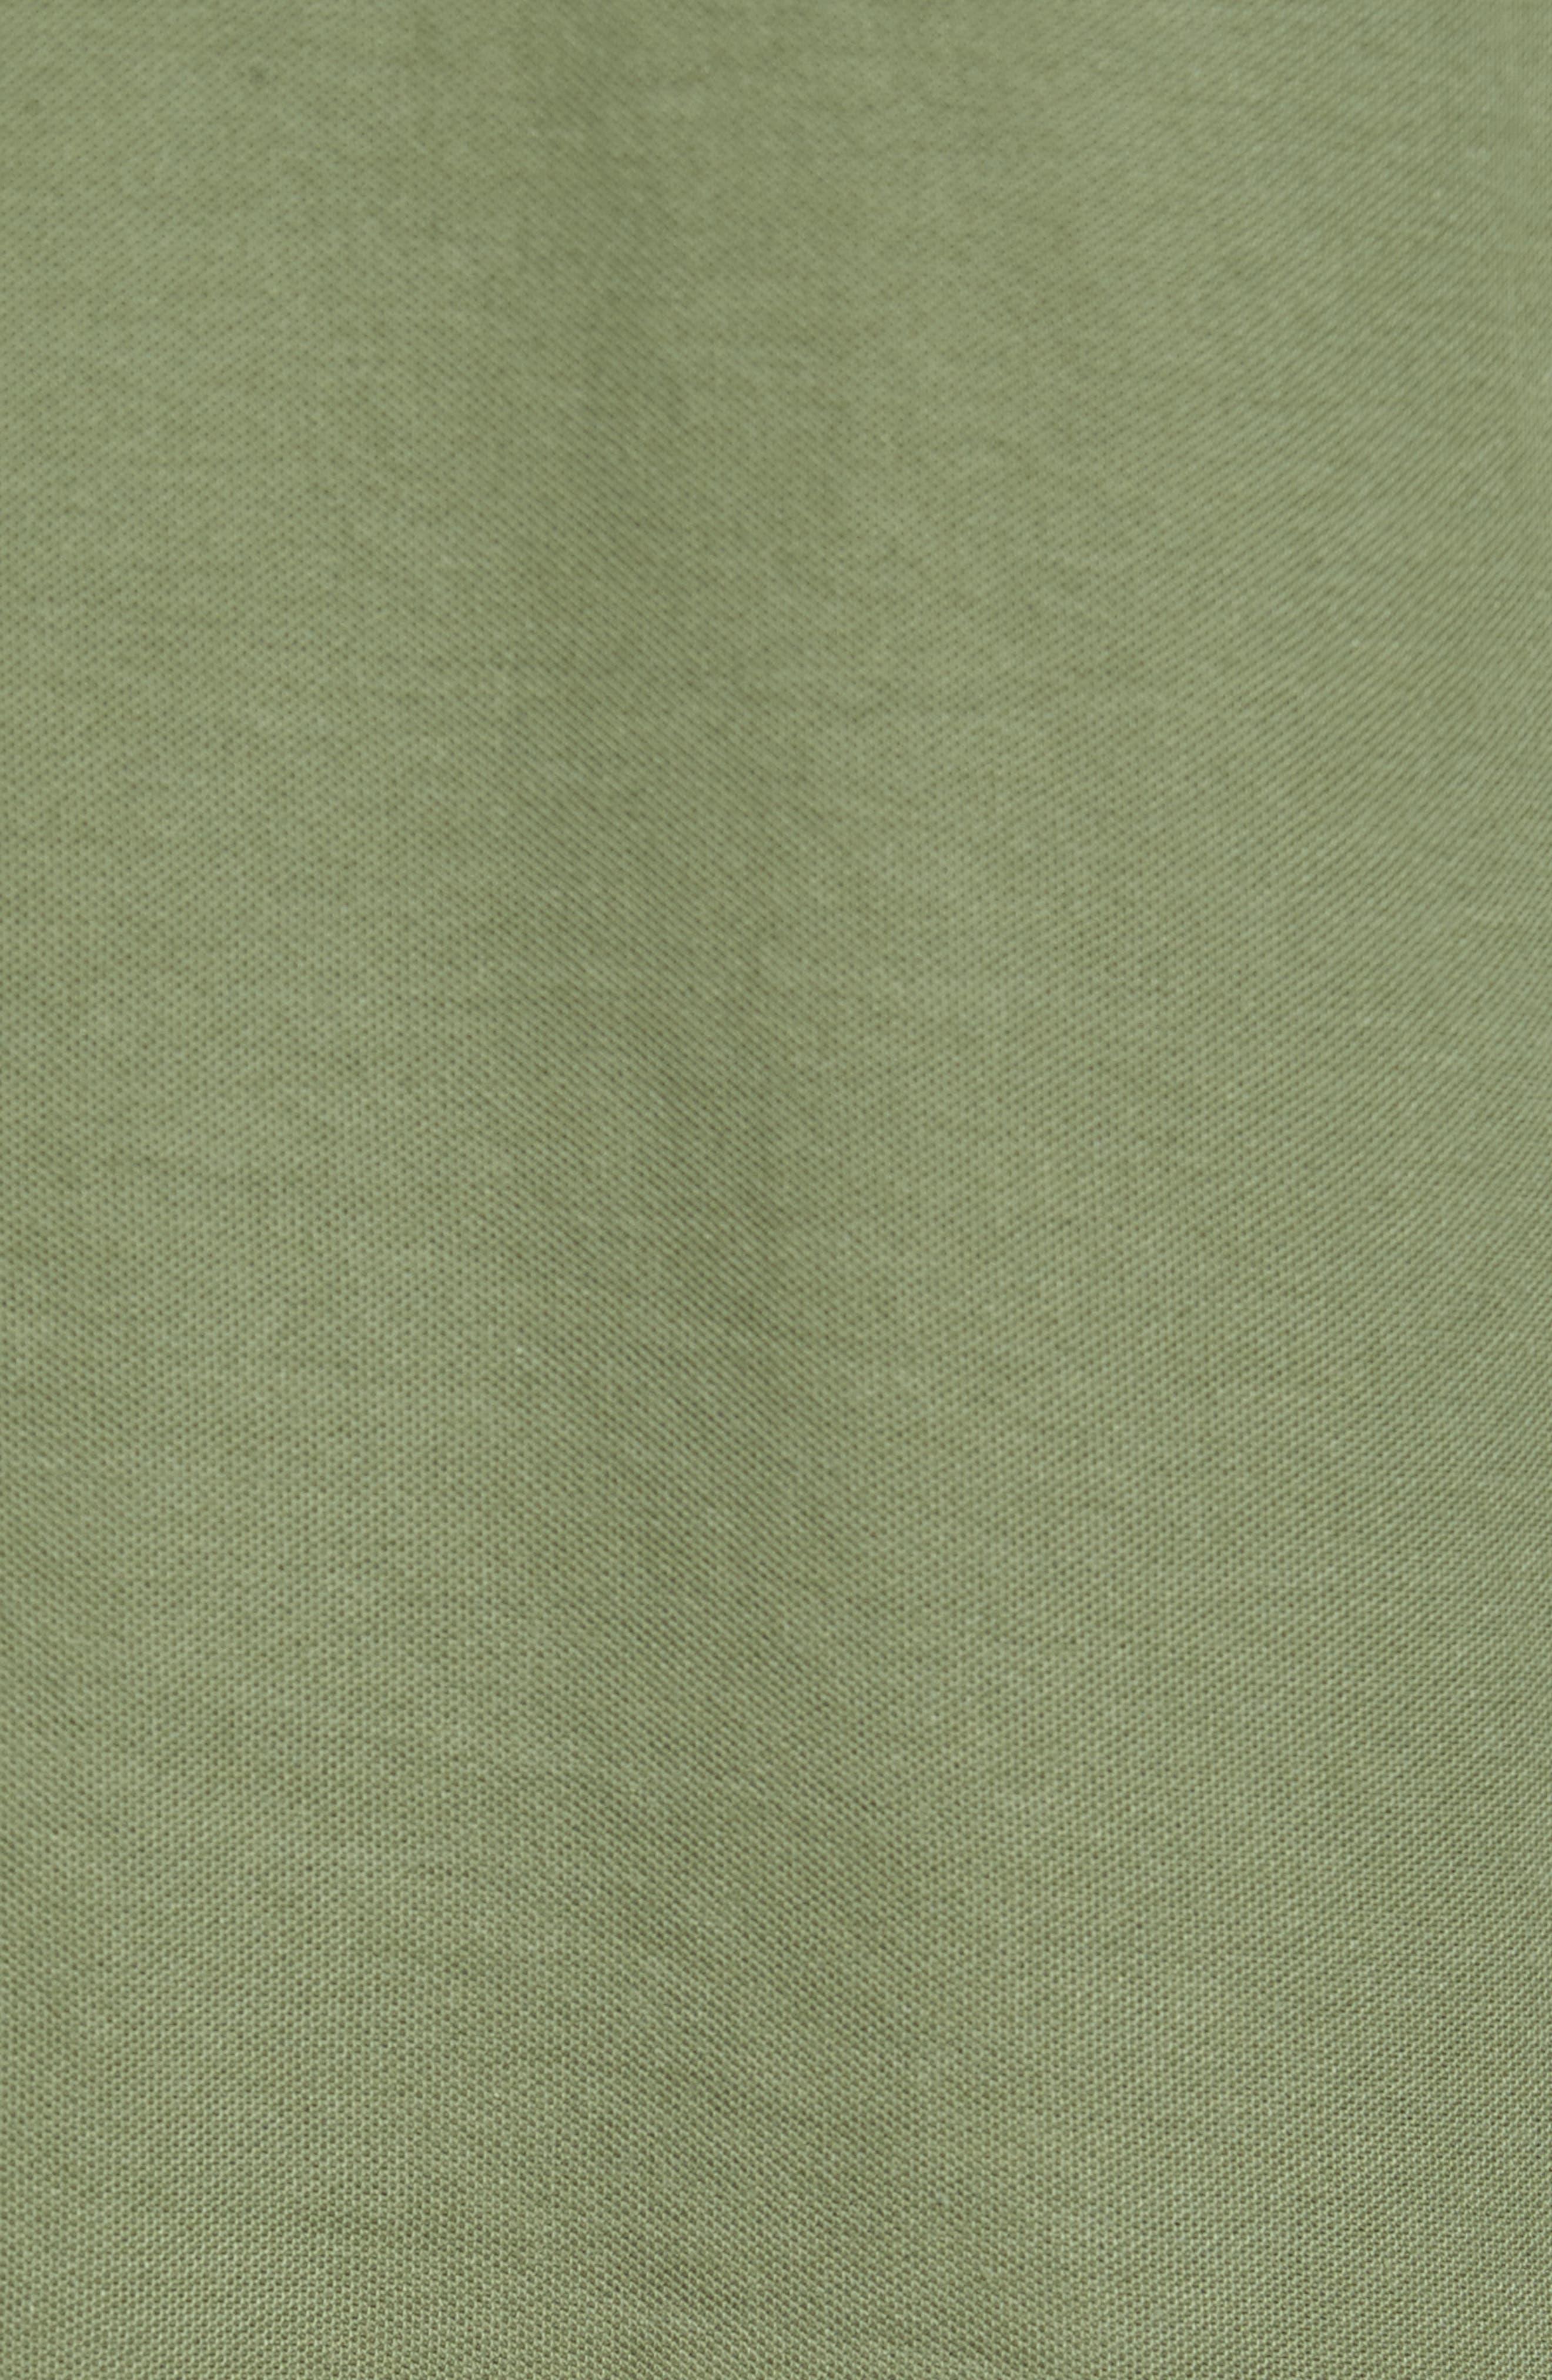 Alternate Image 5  - Tommy Bahama Tropicool Spectator Piqué Polo